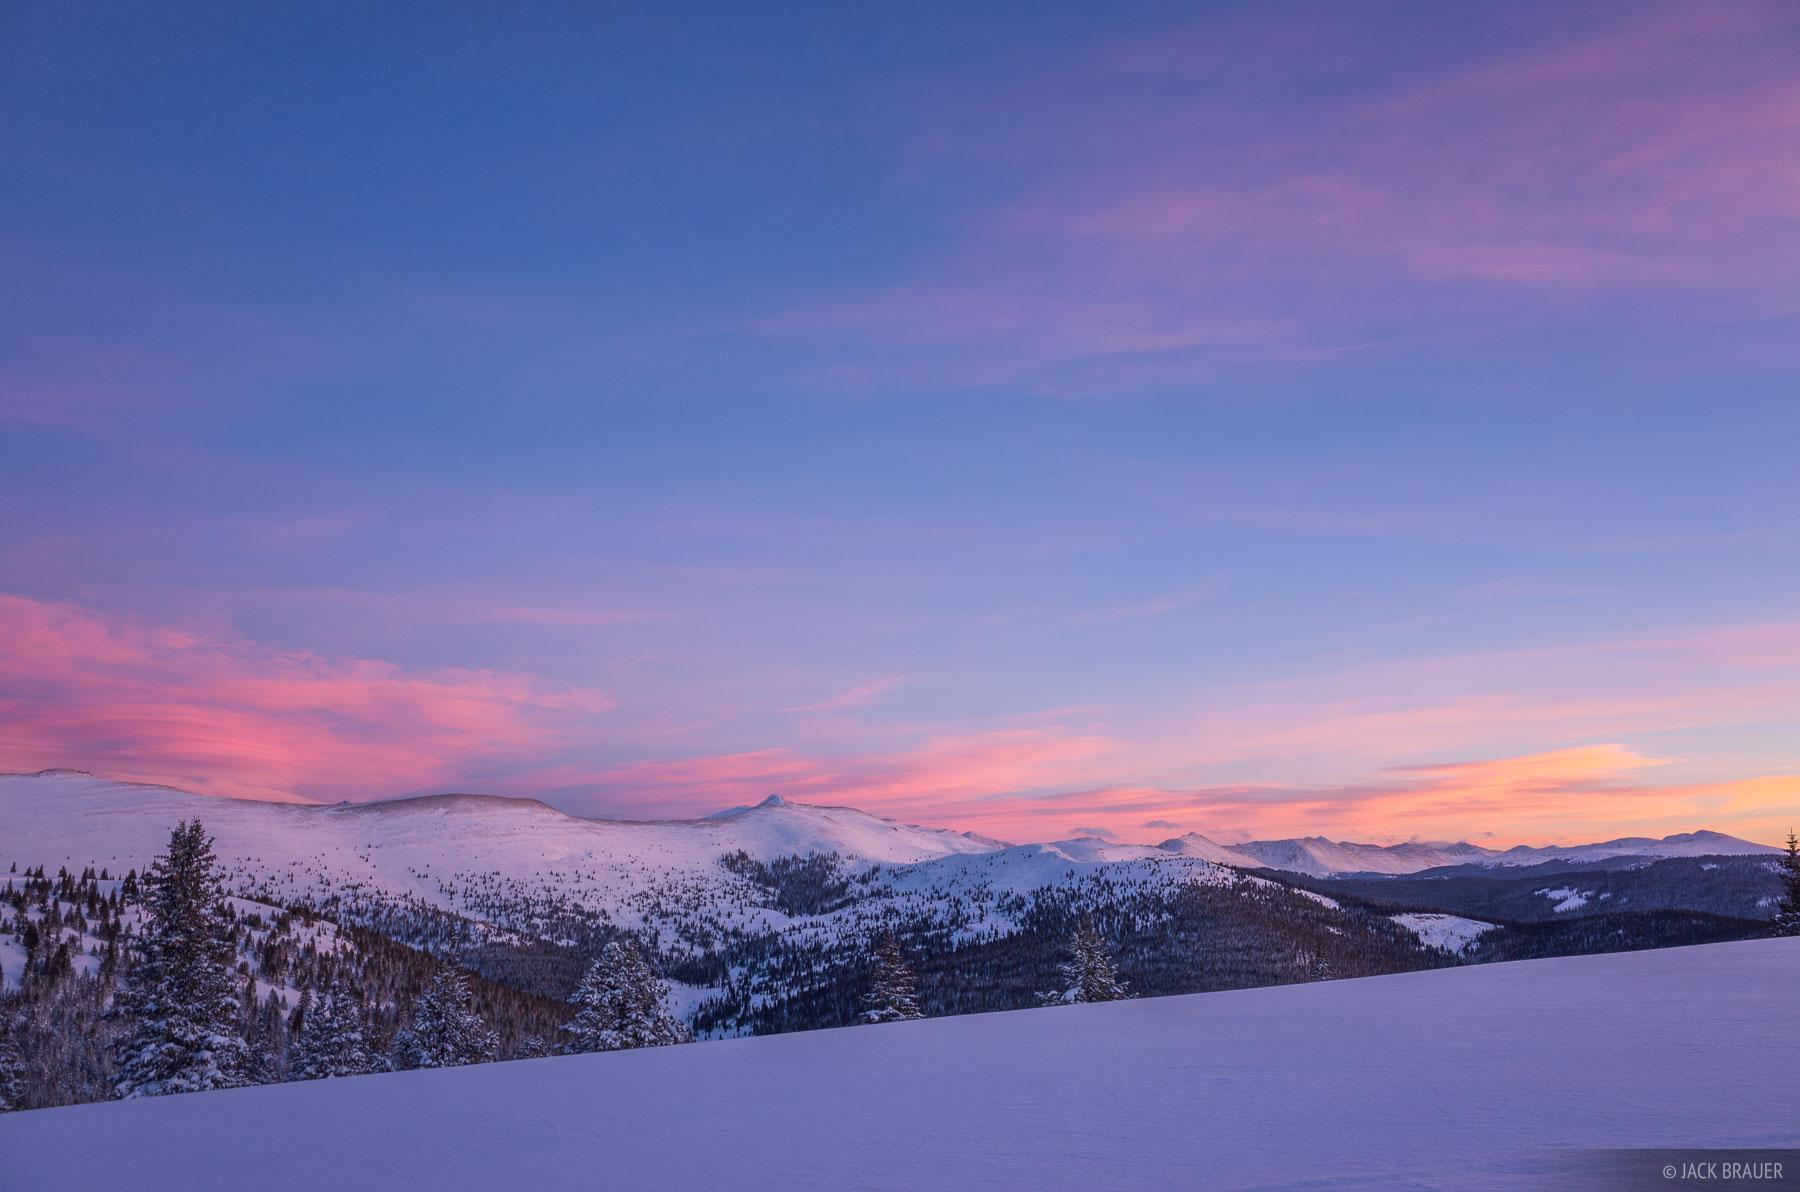 Colorado, Fowler Hilliard, Gore Range, January, sunset, Fowler/Hilliard, winter, active, 2014